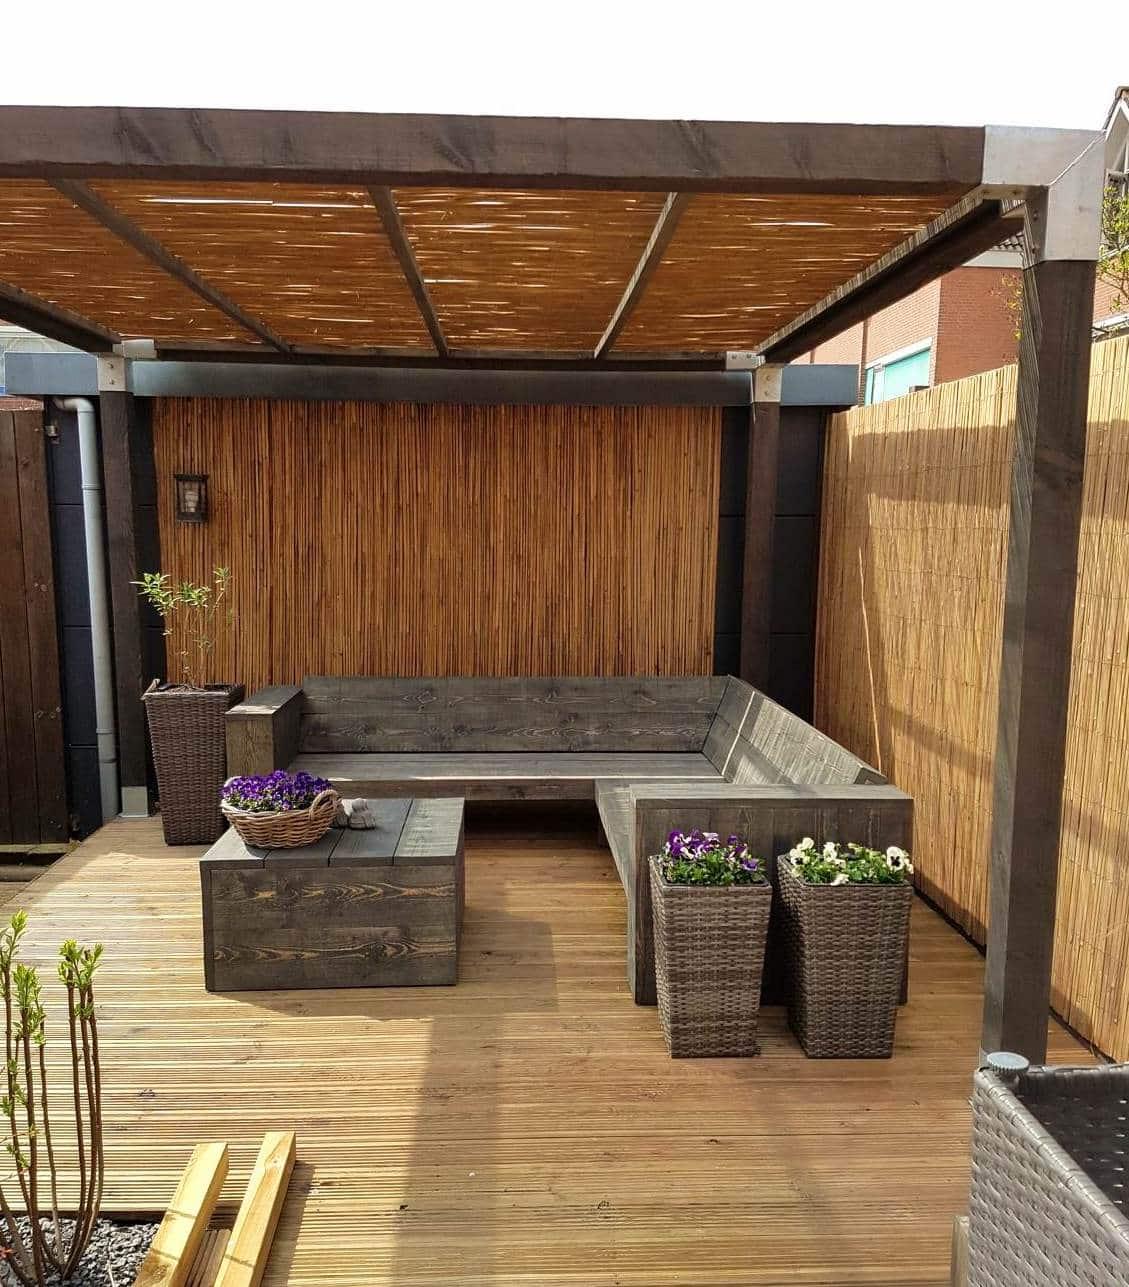 Gespleten bamboe matten op rol